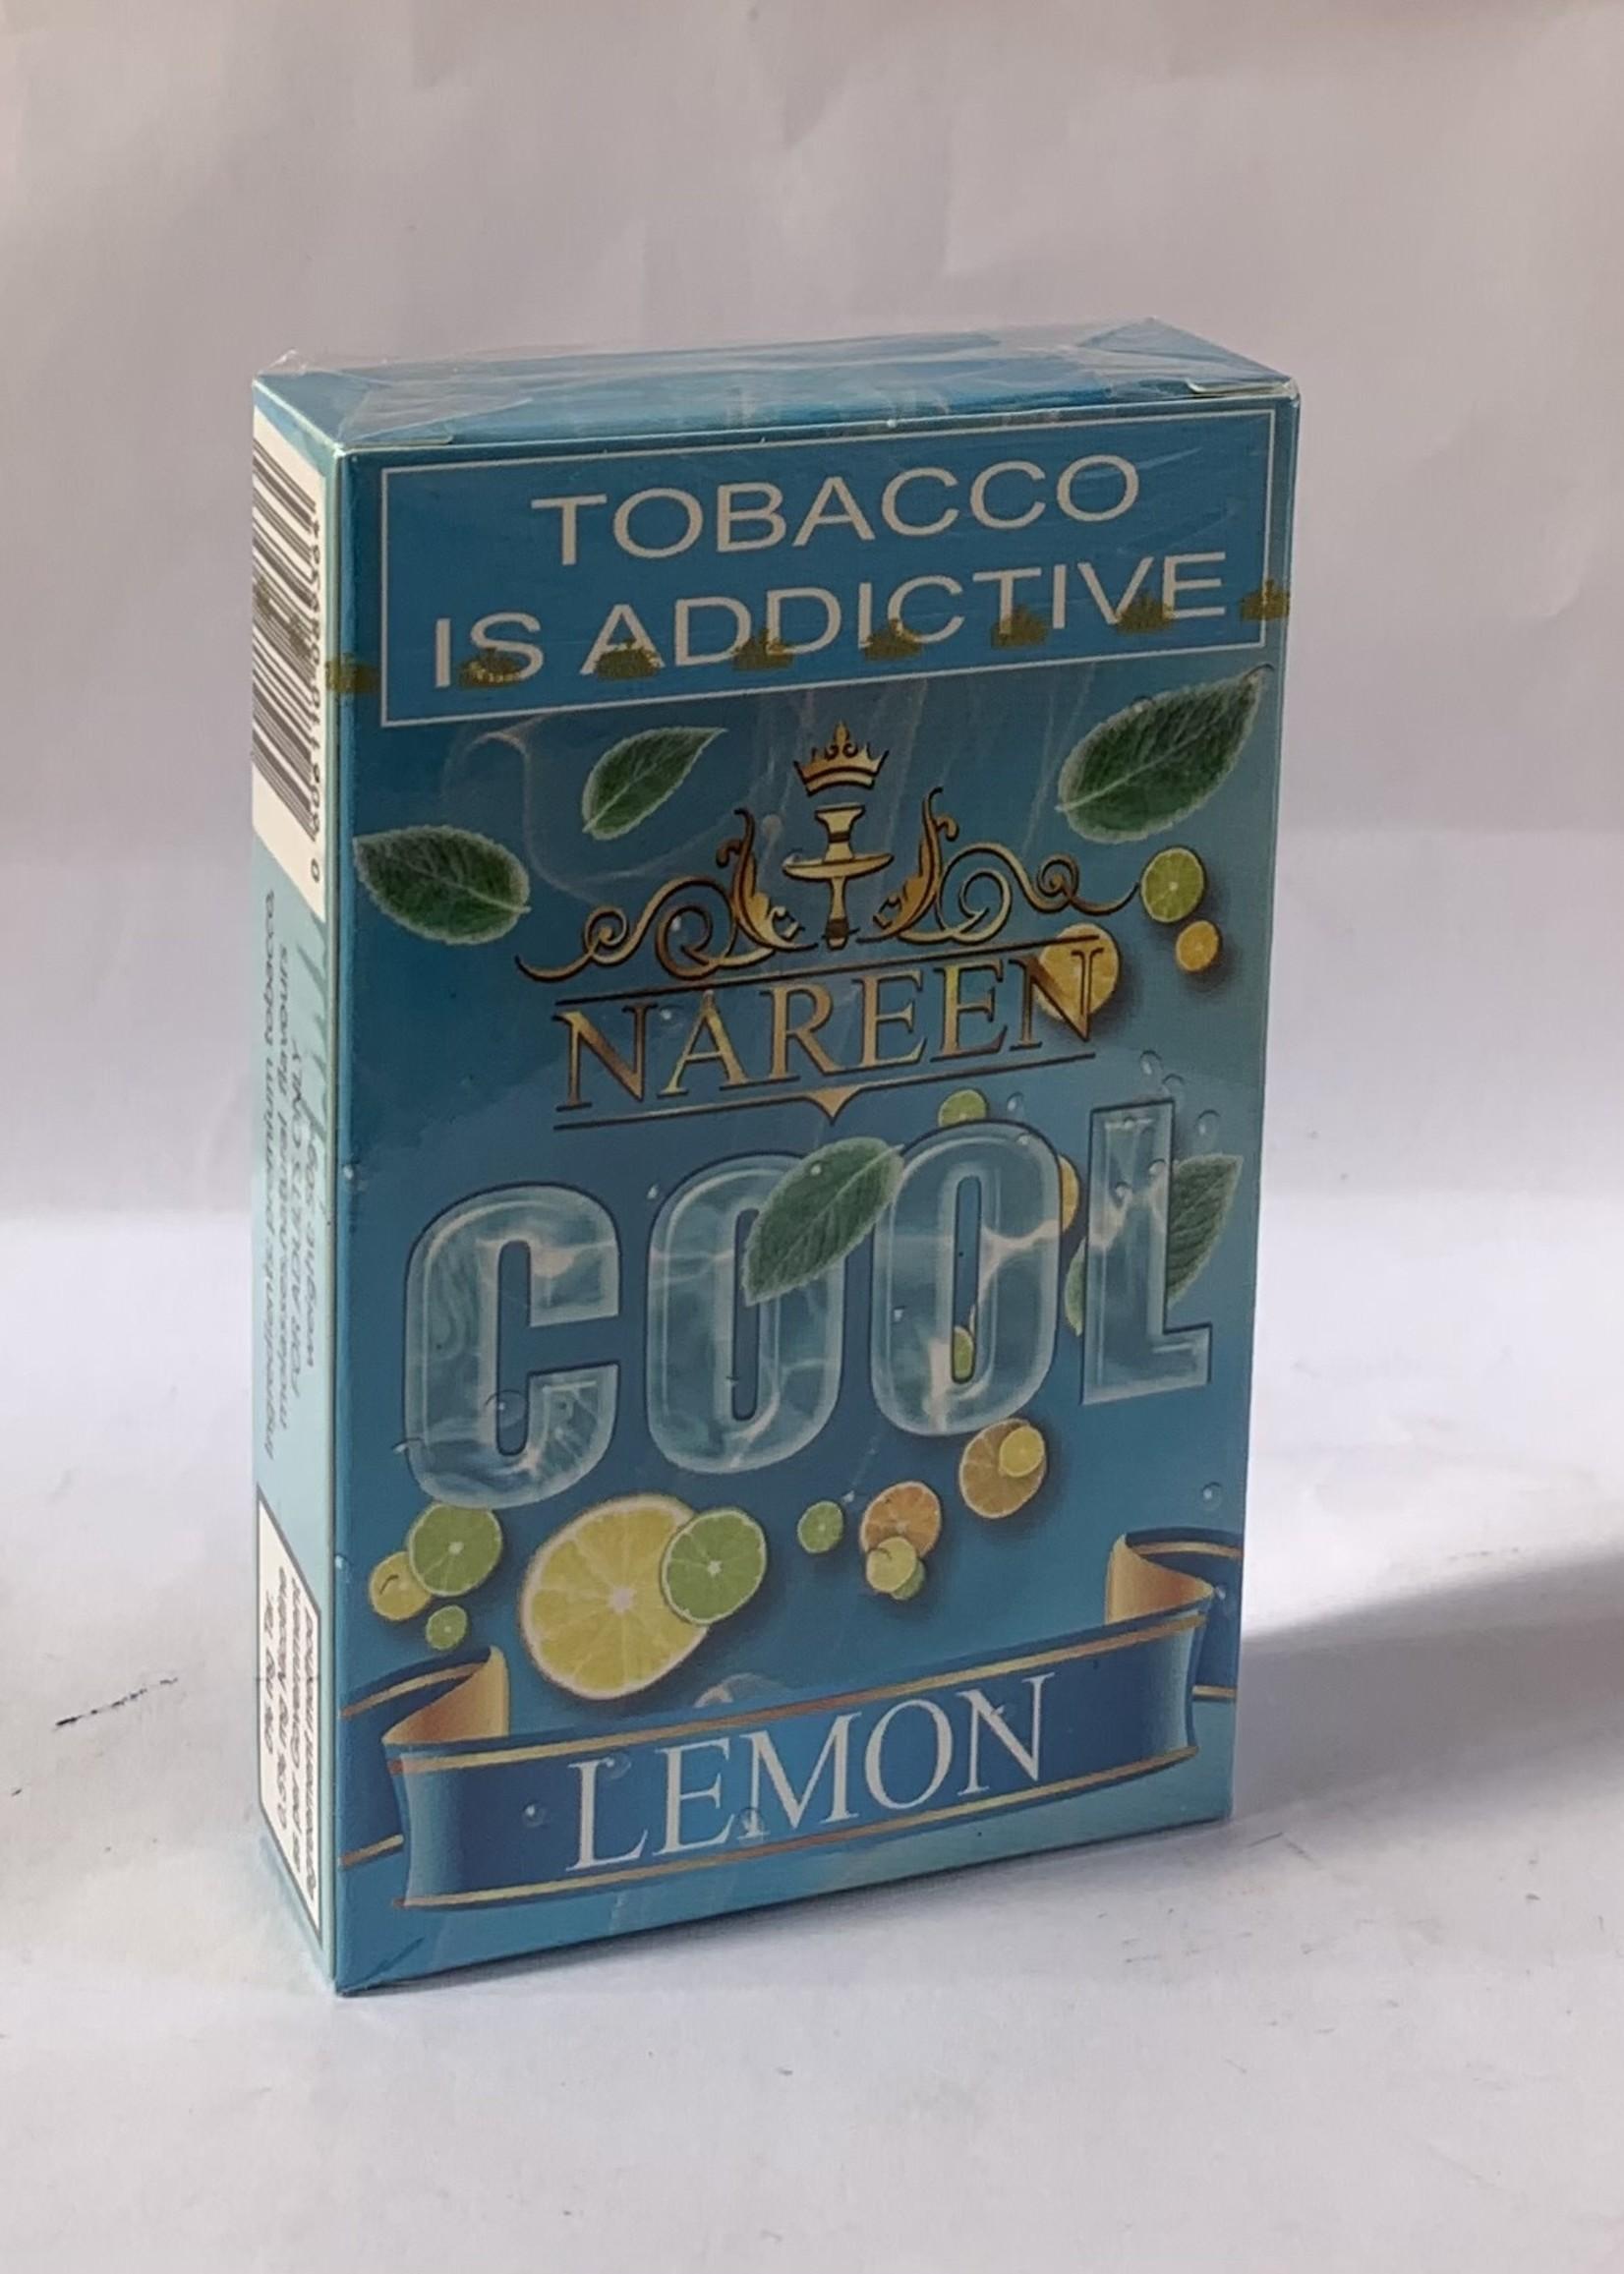 Nareen hubbly flavour - cool lemon